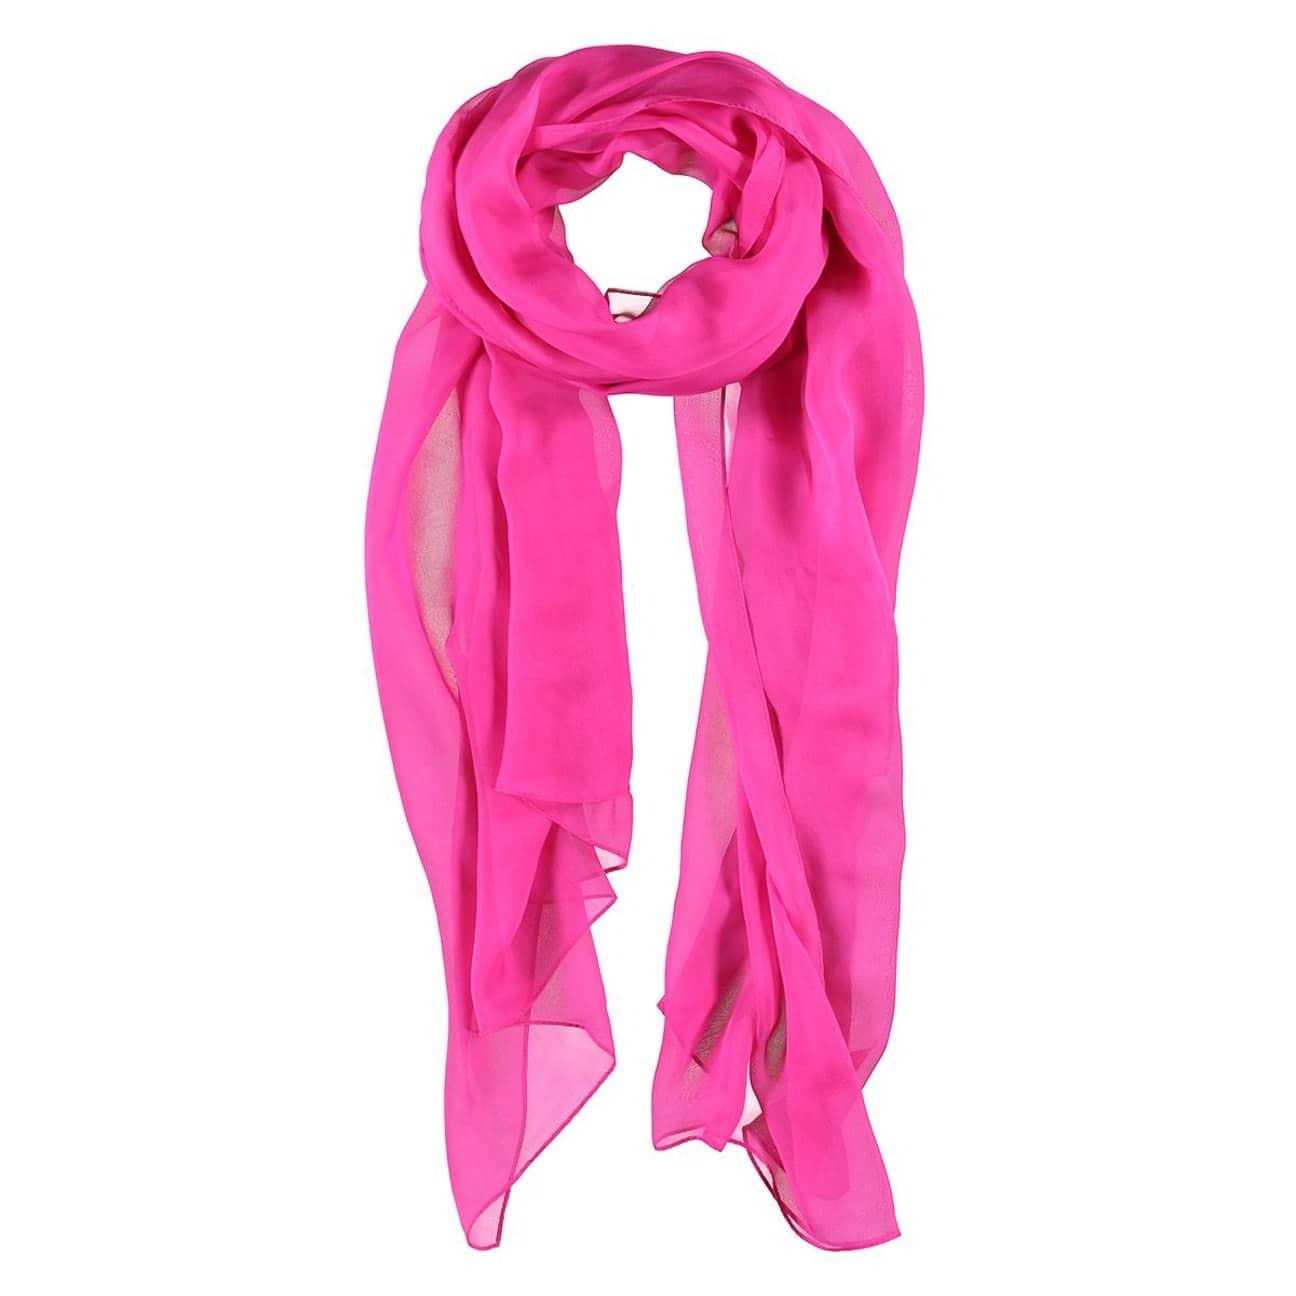 8066ad3c664 ... Foulard Soie Chiffon by Passigatti - pink 1